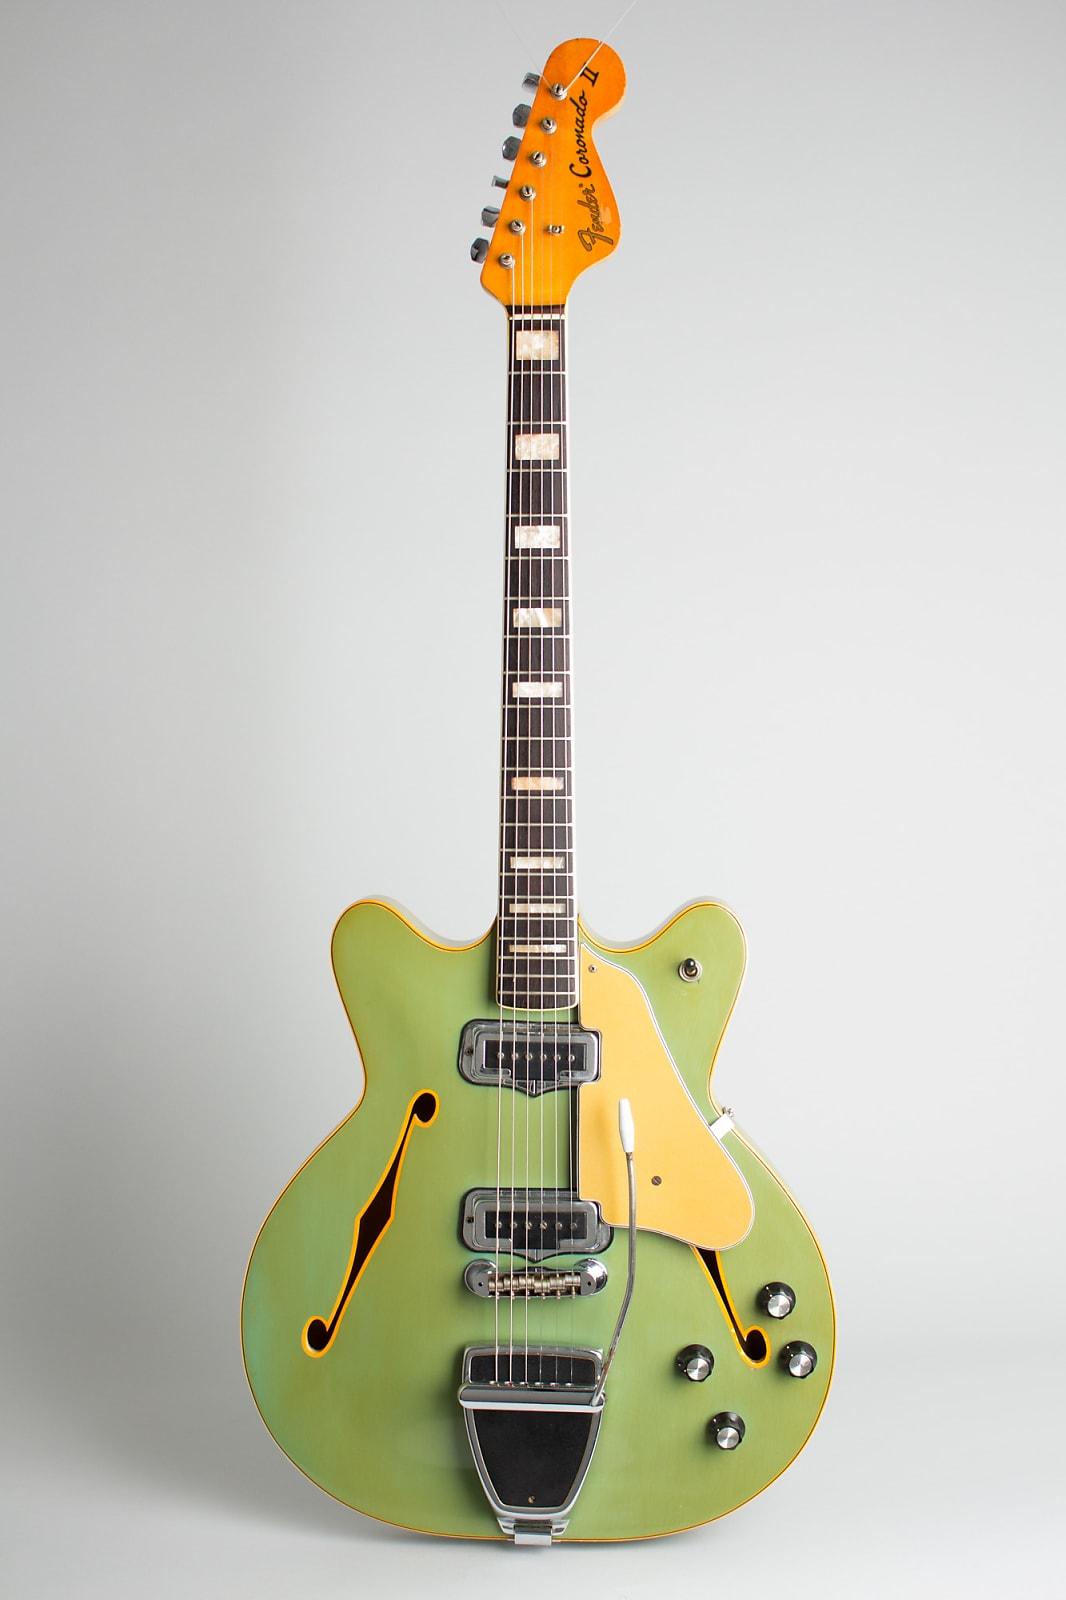 Fender  Coronado II Thinline Hollow Body Electric Guitar (1970), ser. #314355, original black chipboard case.